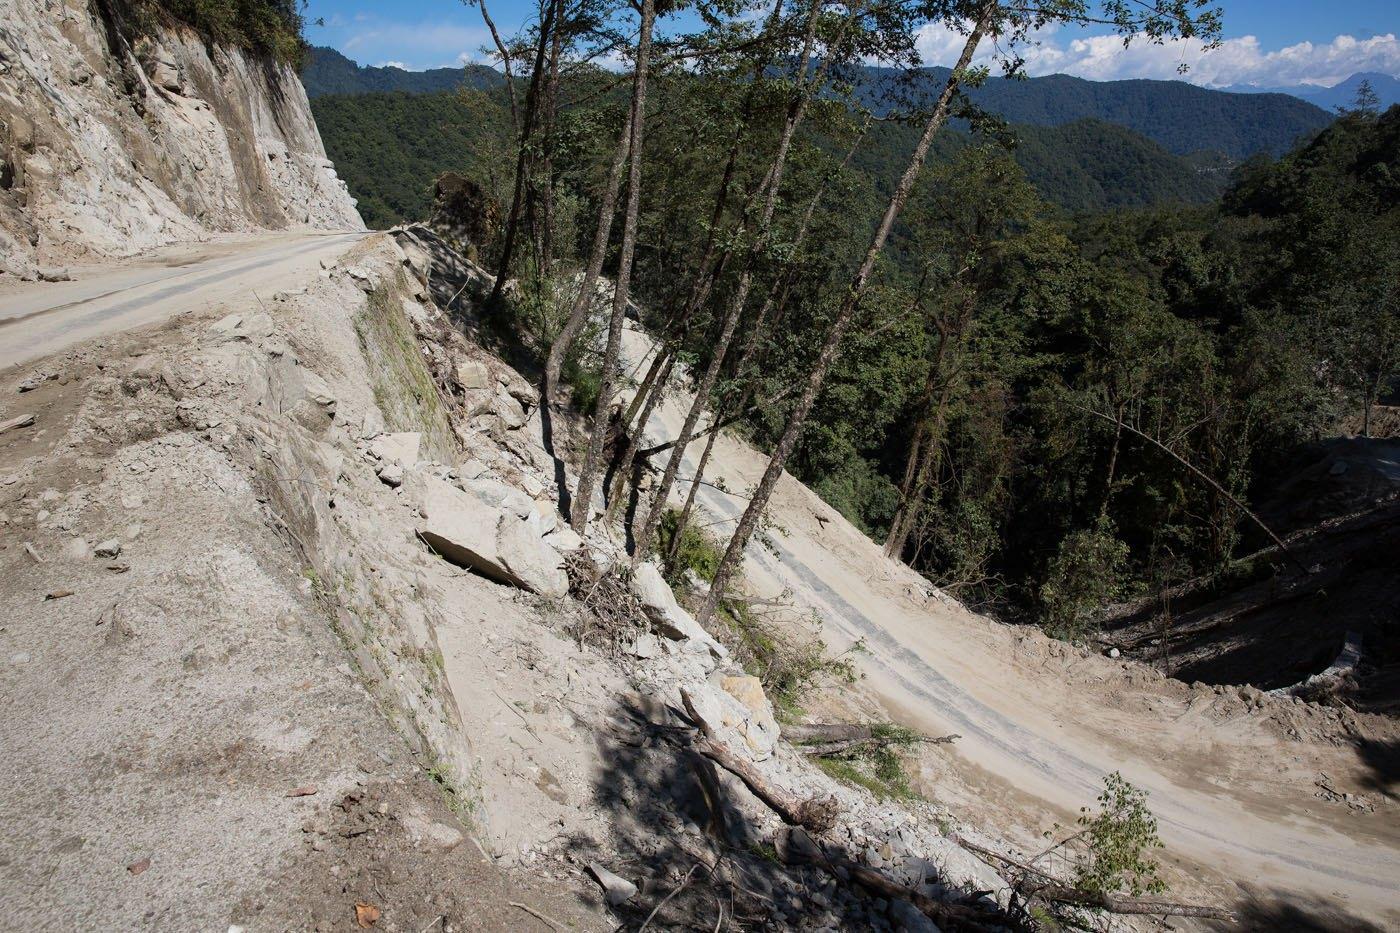 Bhutan Road Construction